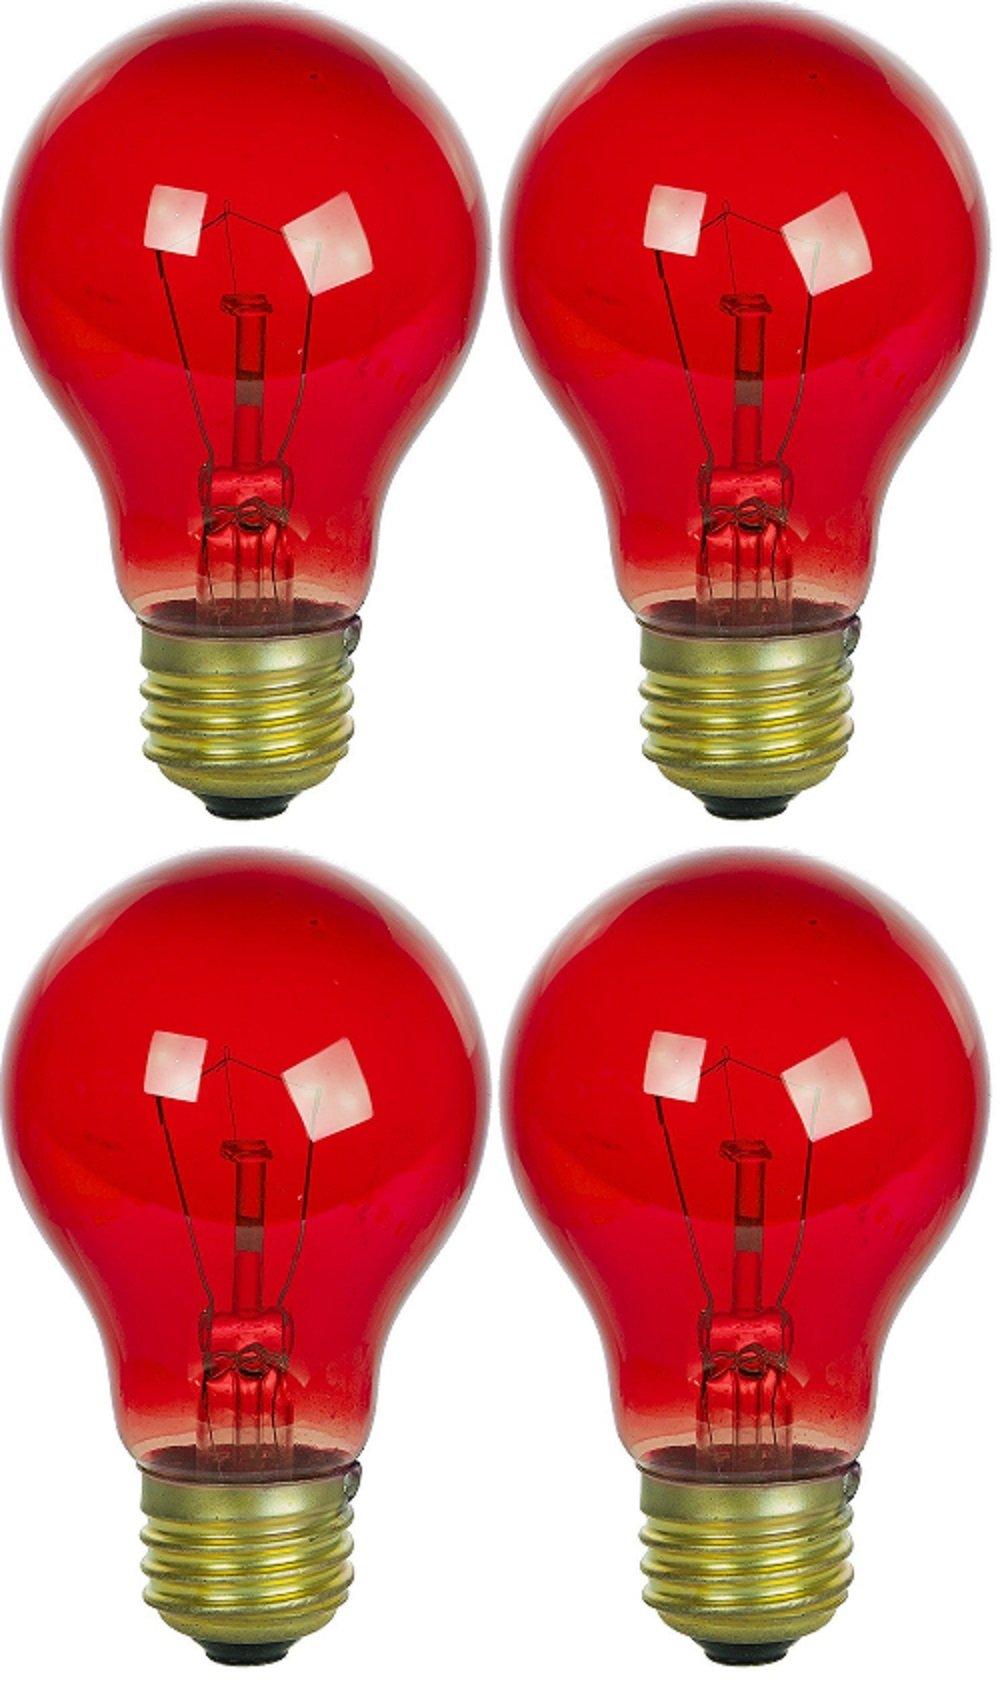 4 Pack 25 Watt A19 Colored Transparent Red Incandescent Medium Base Party Light Bulb